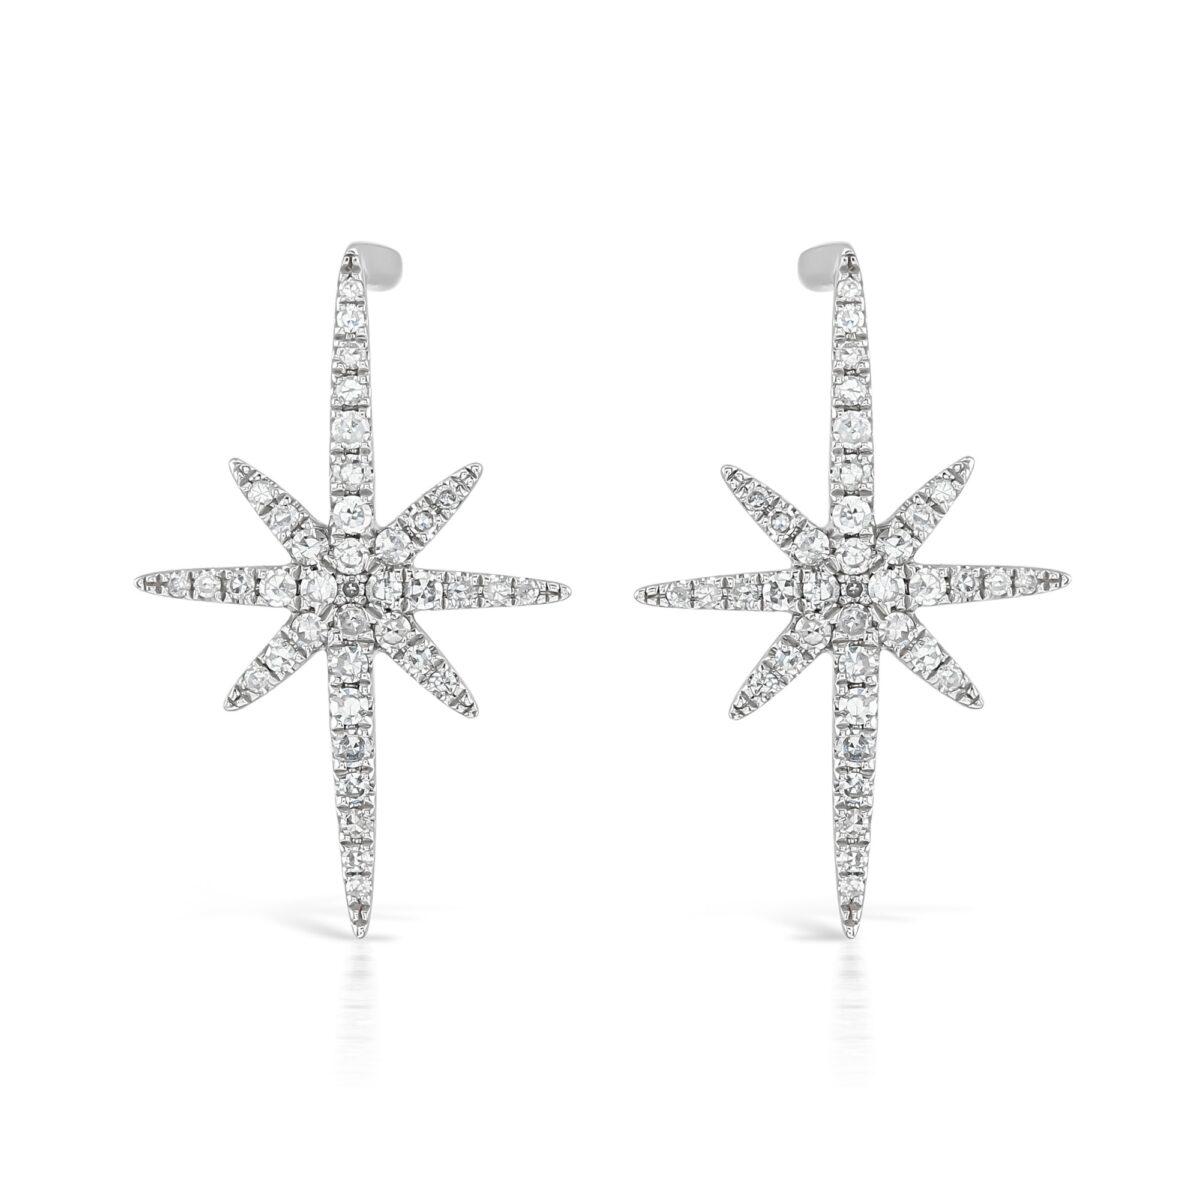 product/s/t/starburst-earrings.jpg;;product/d/m/dmr-packaging_206_1_12_30_1_1_1_1.jpg